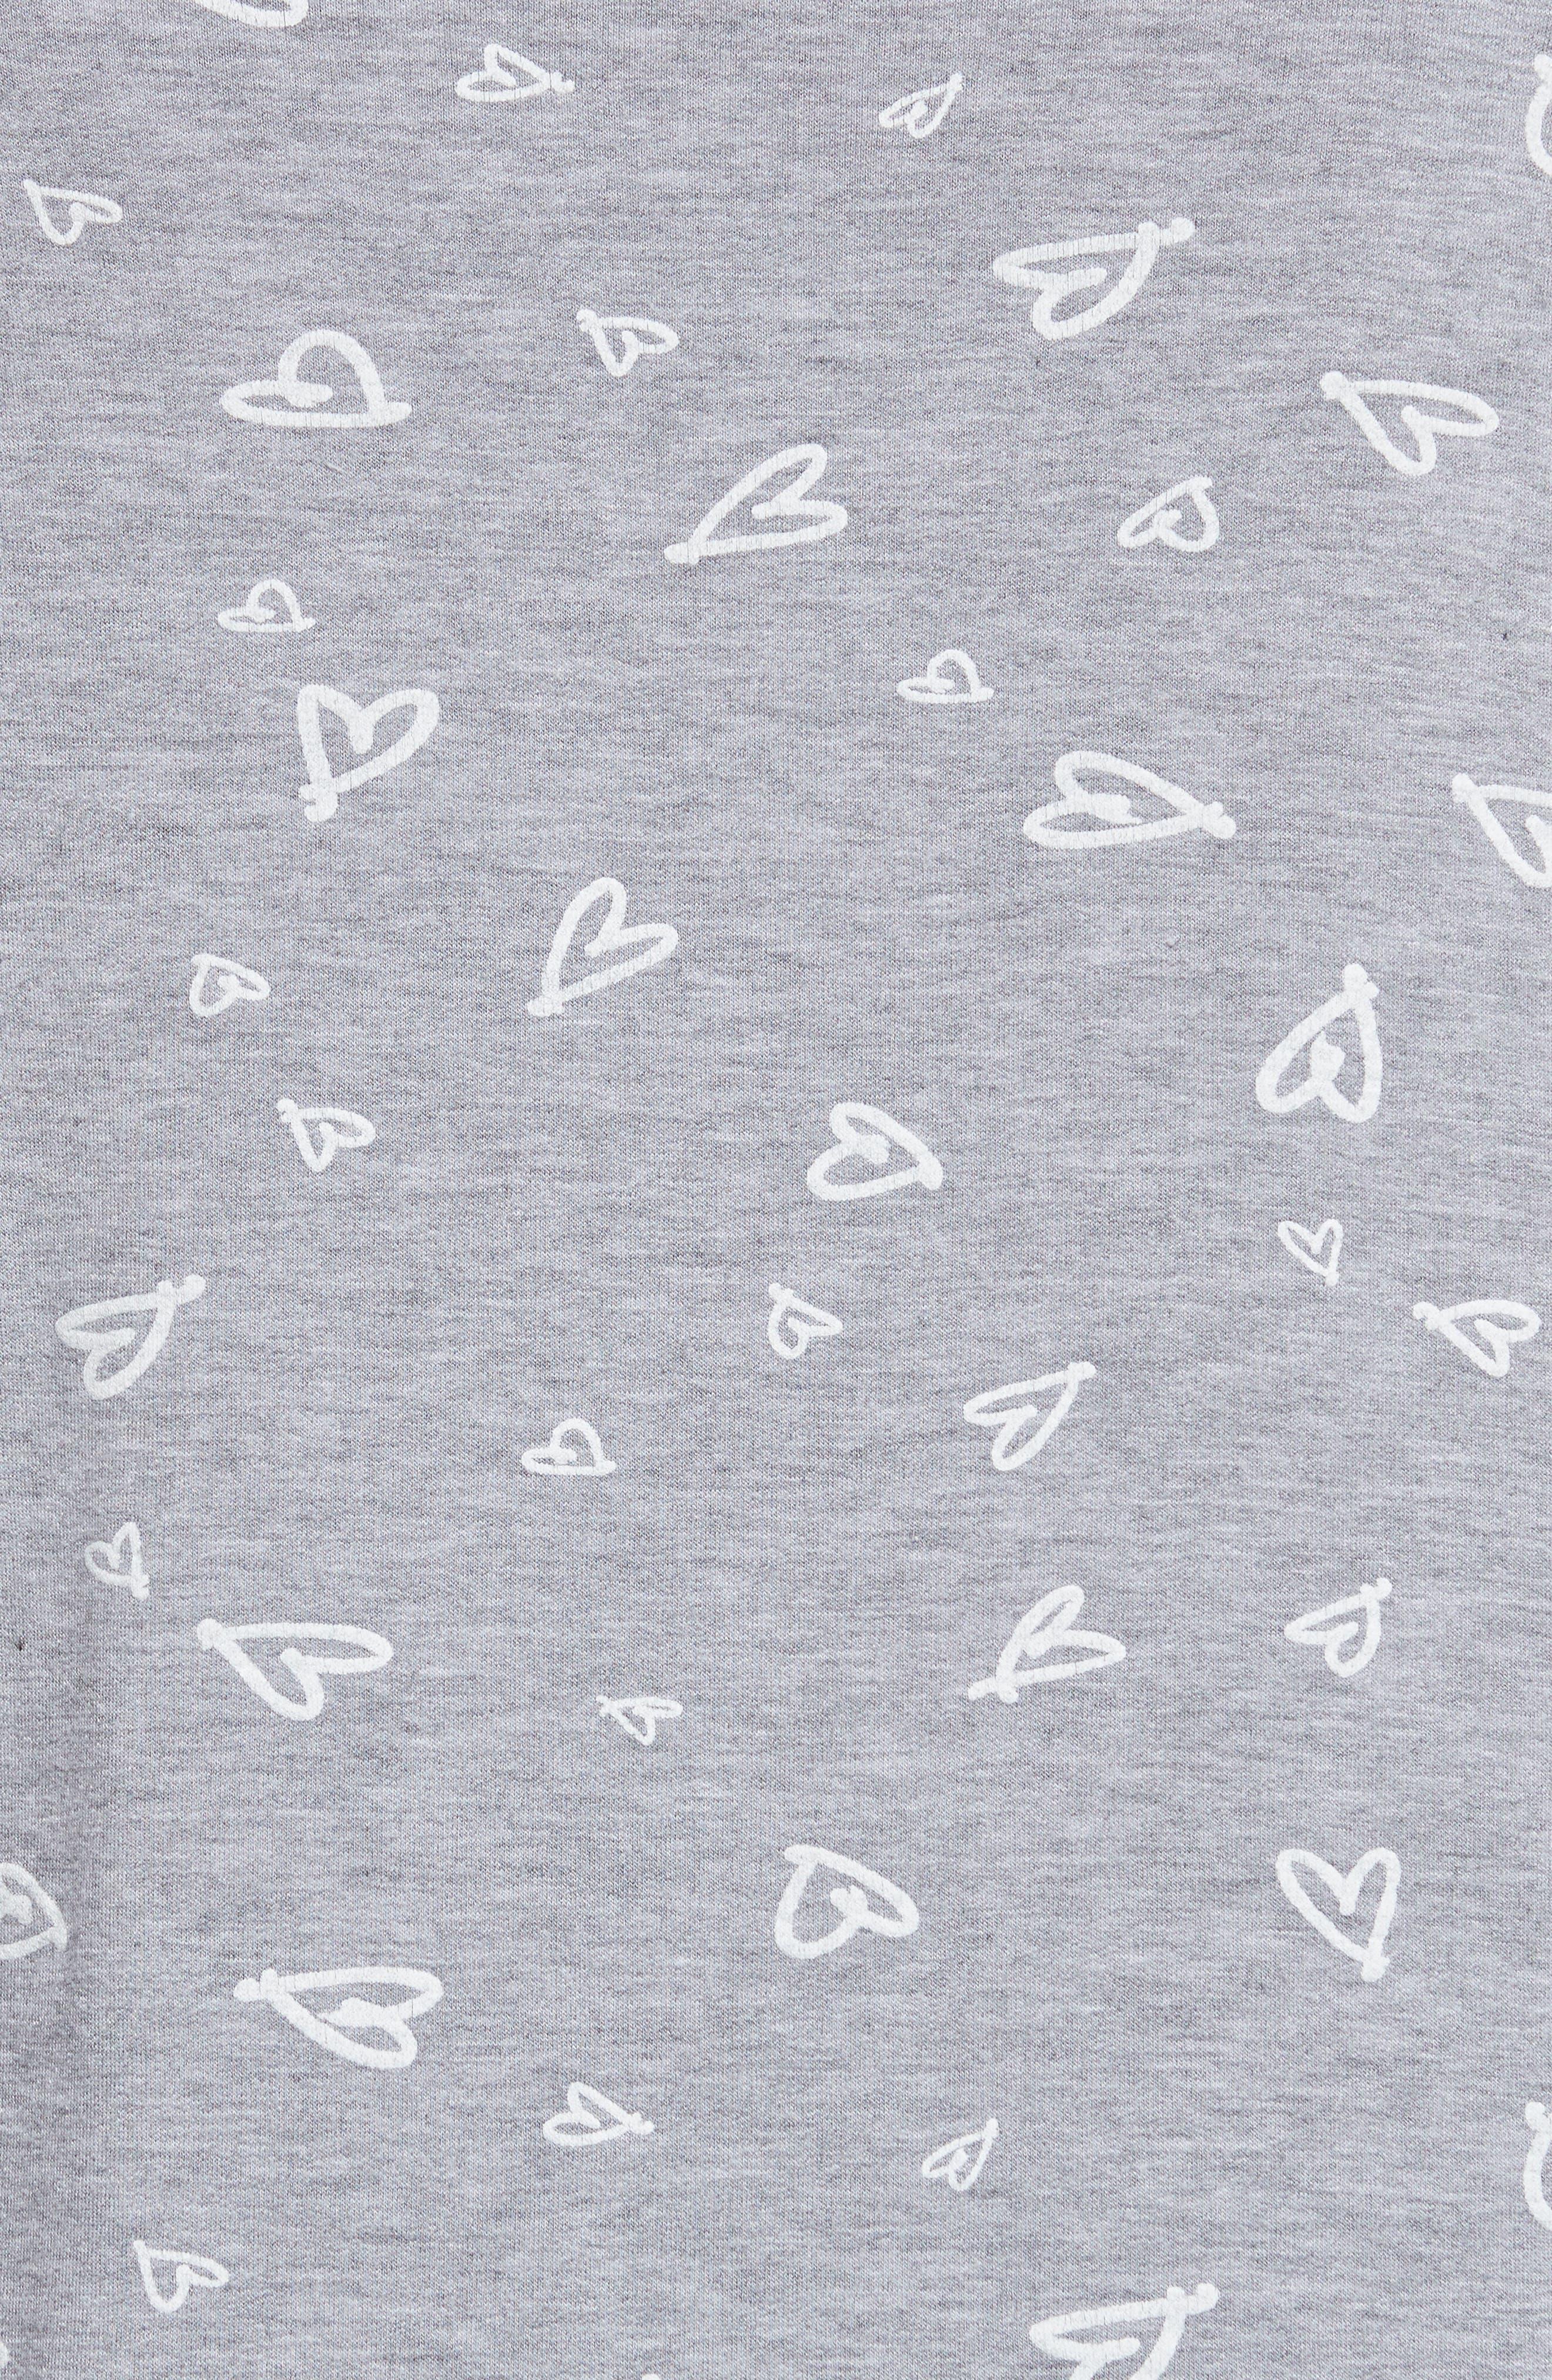 Annora B Print Cotton & Modal Blend Sweatshirt,                             Alternate thumbnail 5, color,                             071